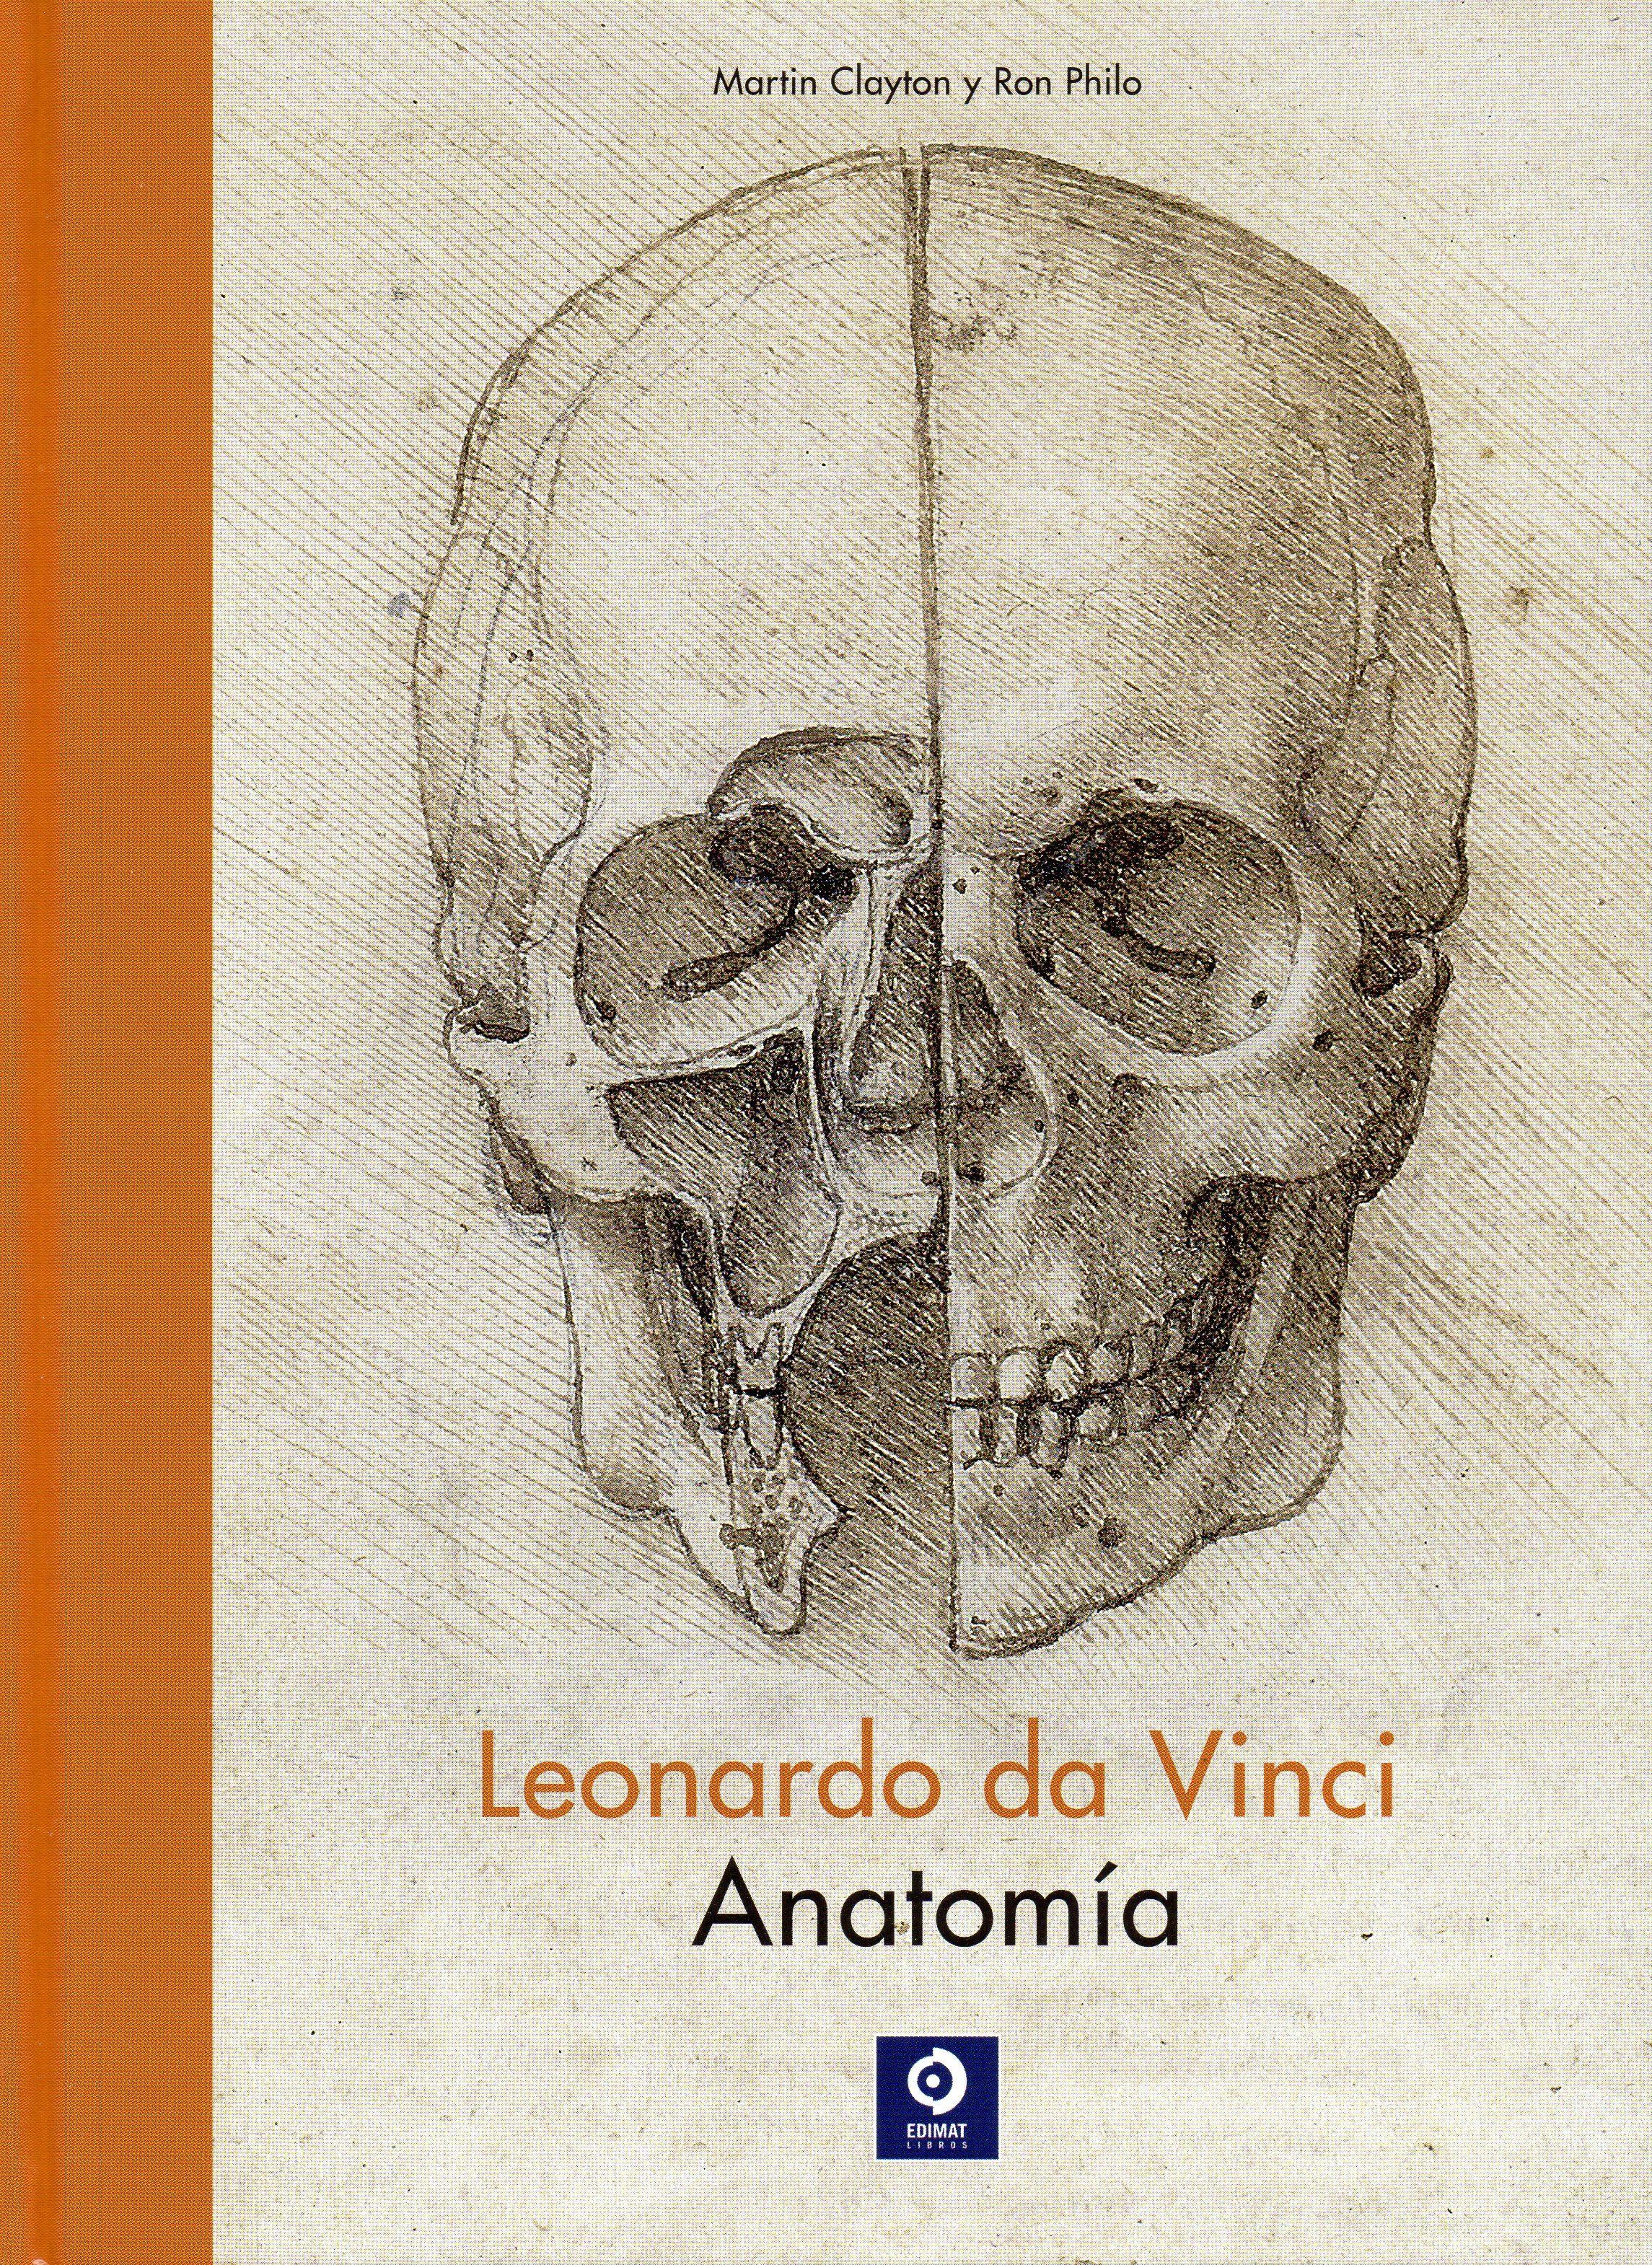 LEONARDO DA VINCI. ANATOMIA | MARTIN CLAYTON | Comprar libro ...